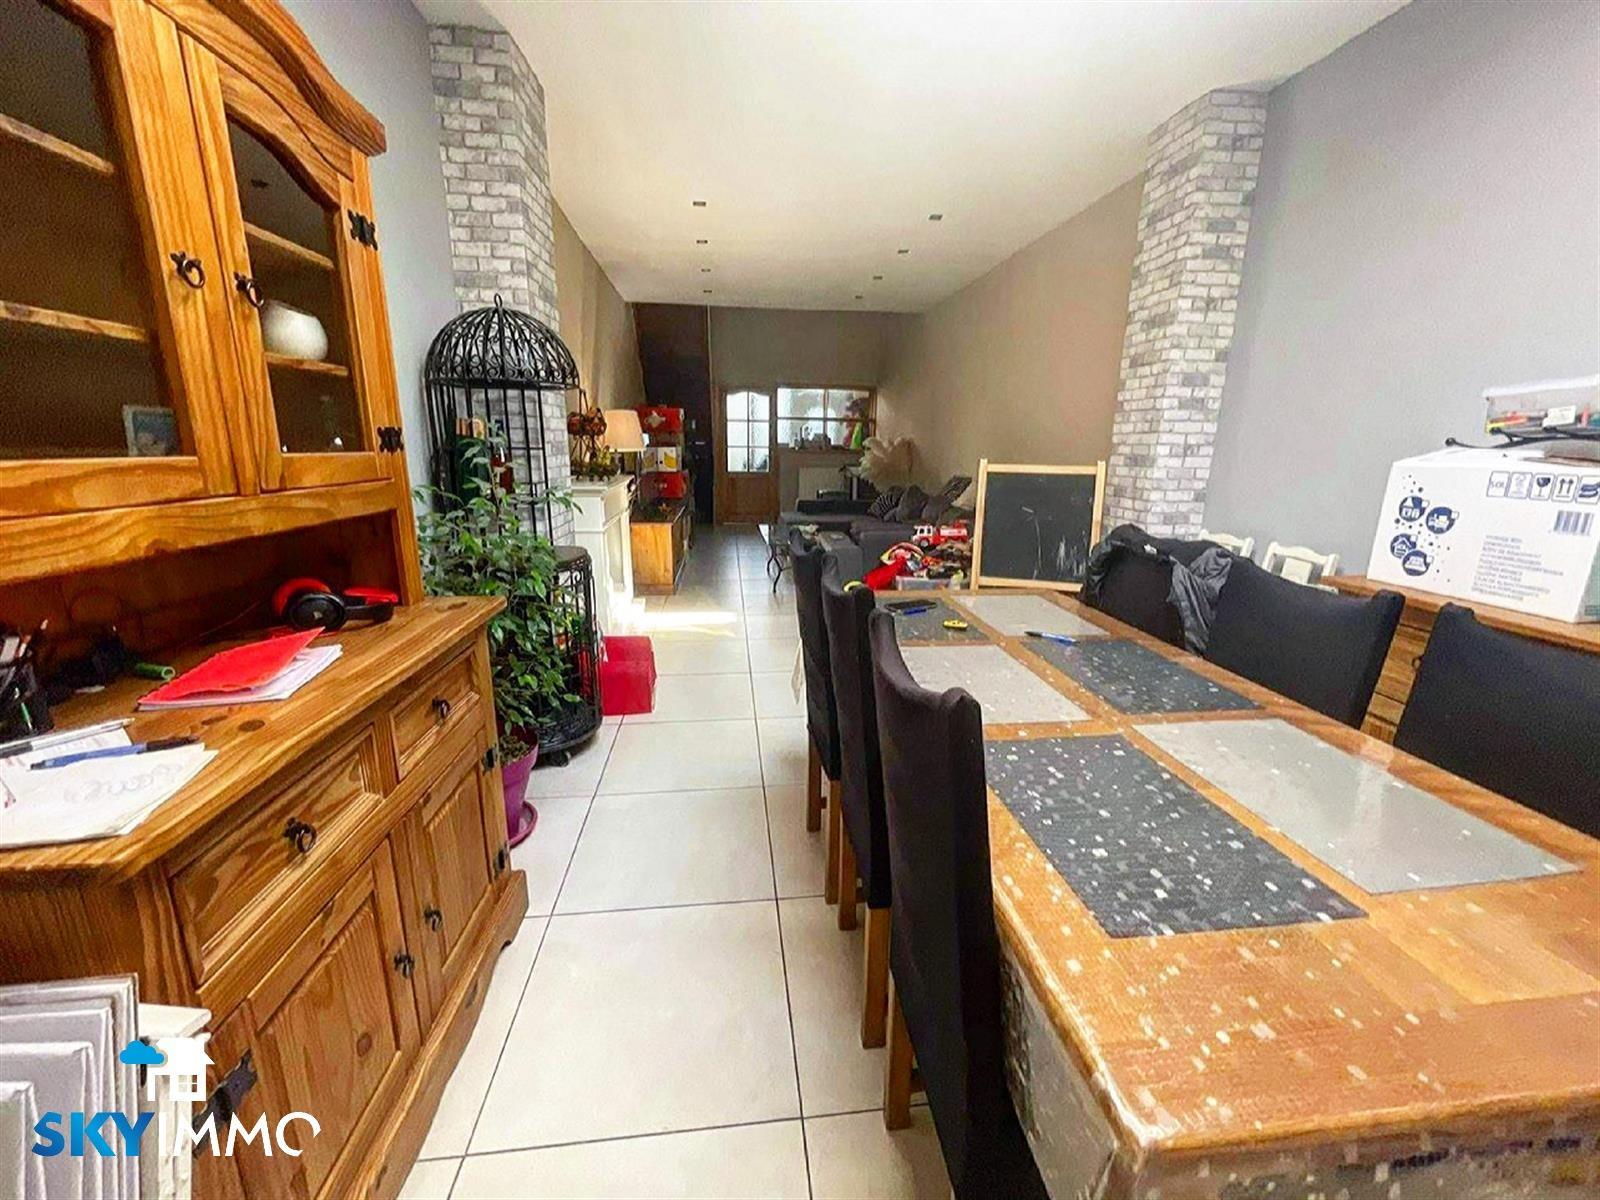 Maison - Seraing Jemeppesur-Meuse - #4343977-5